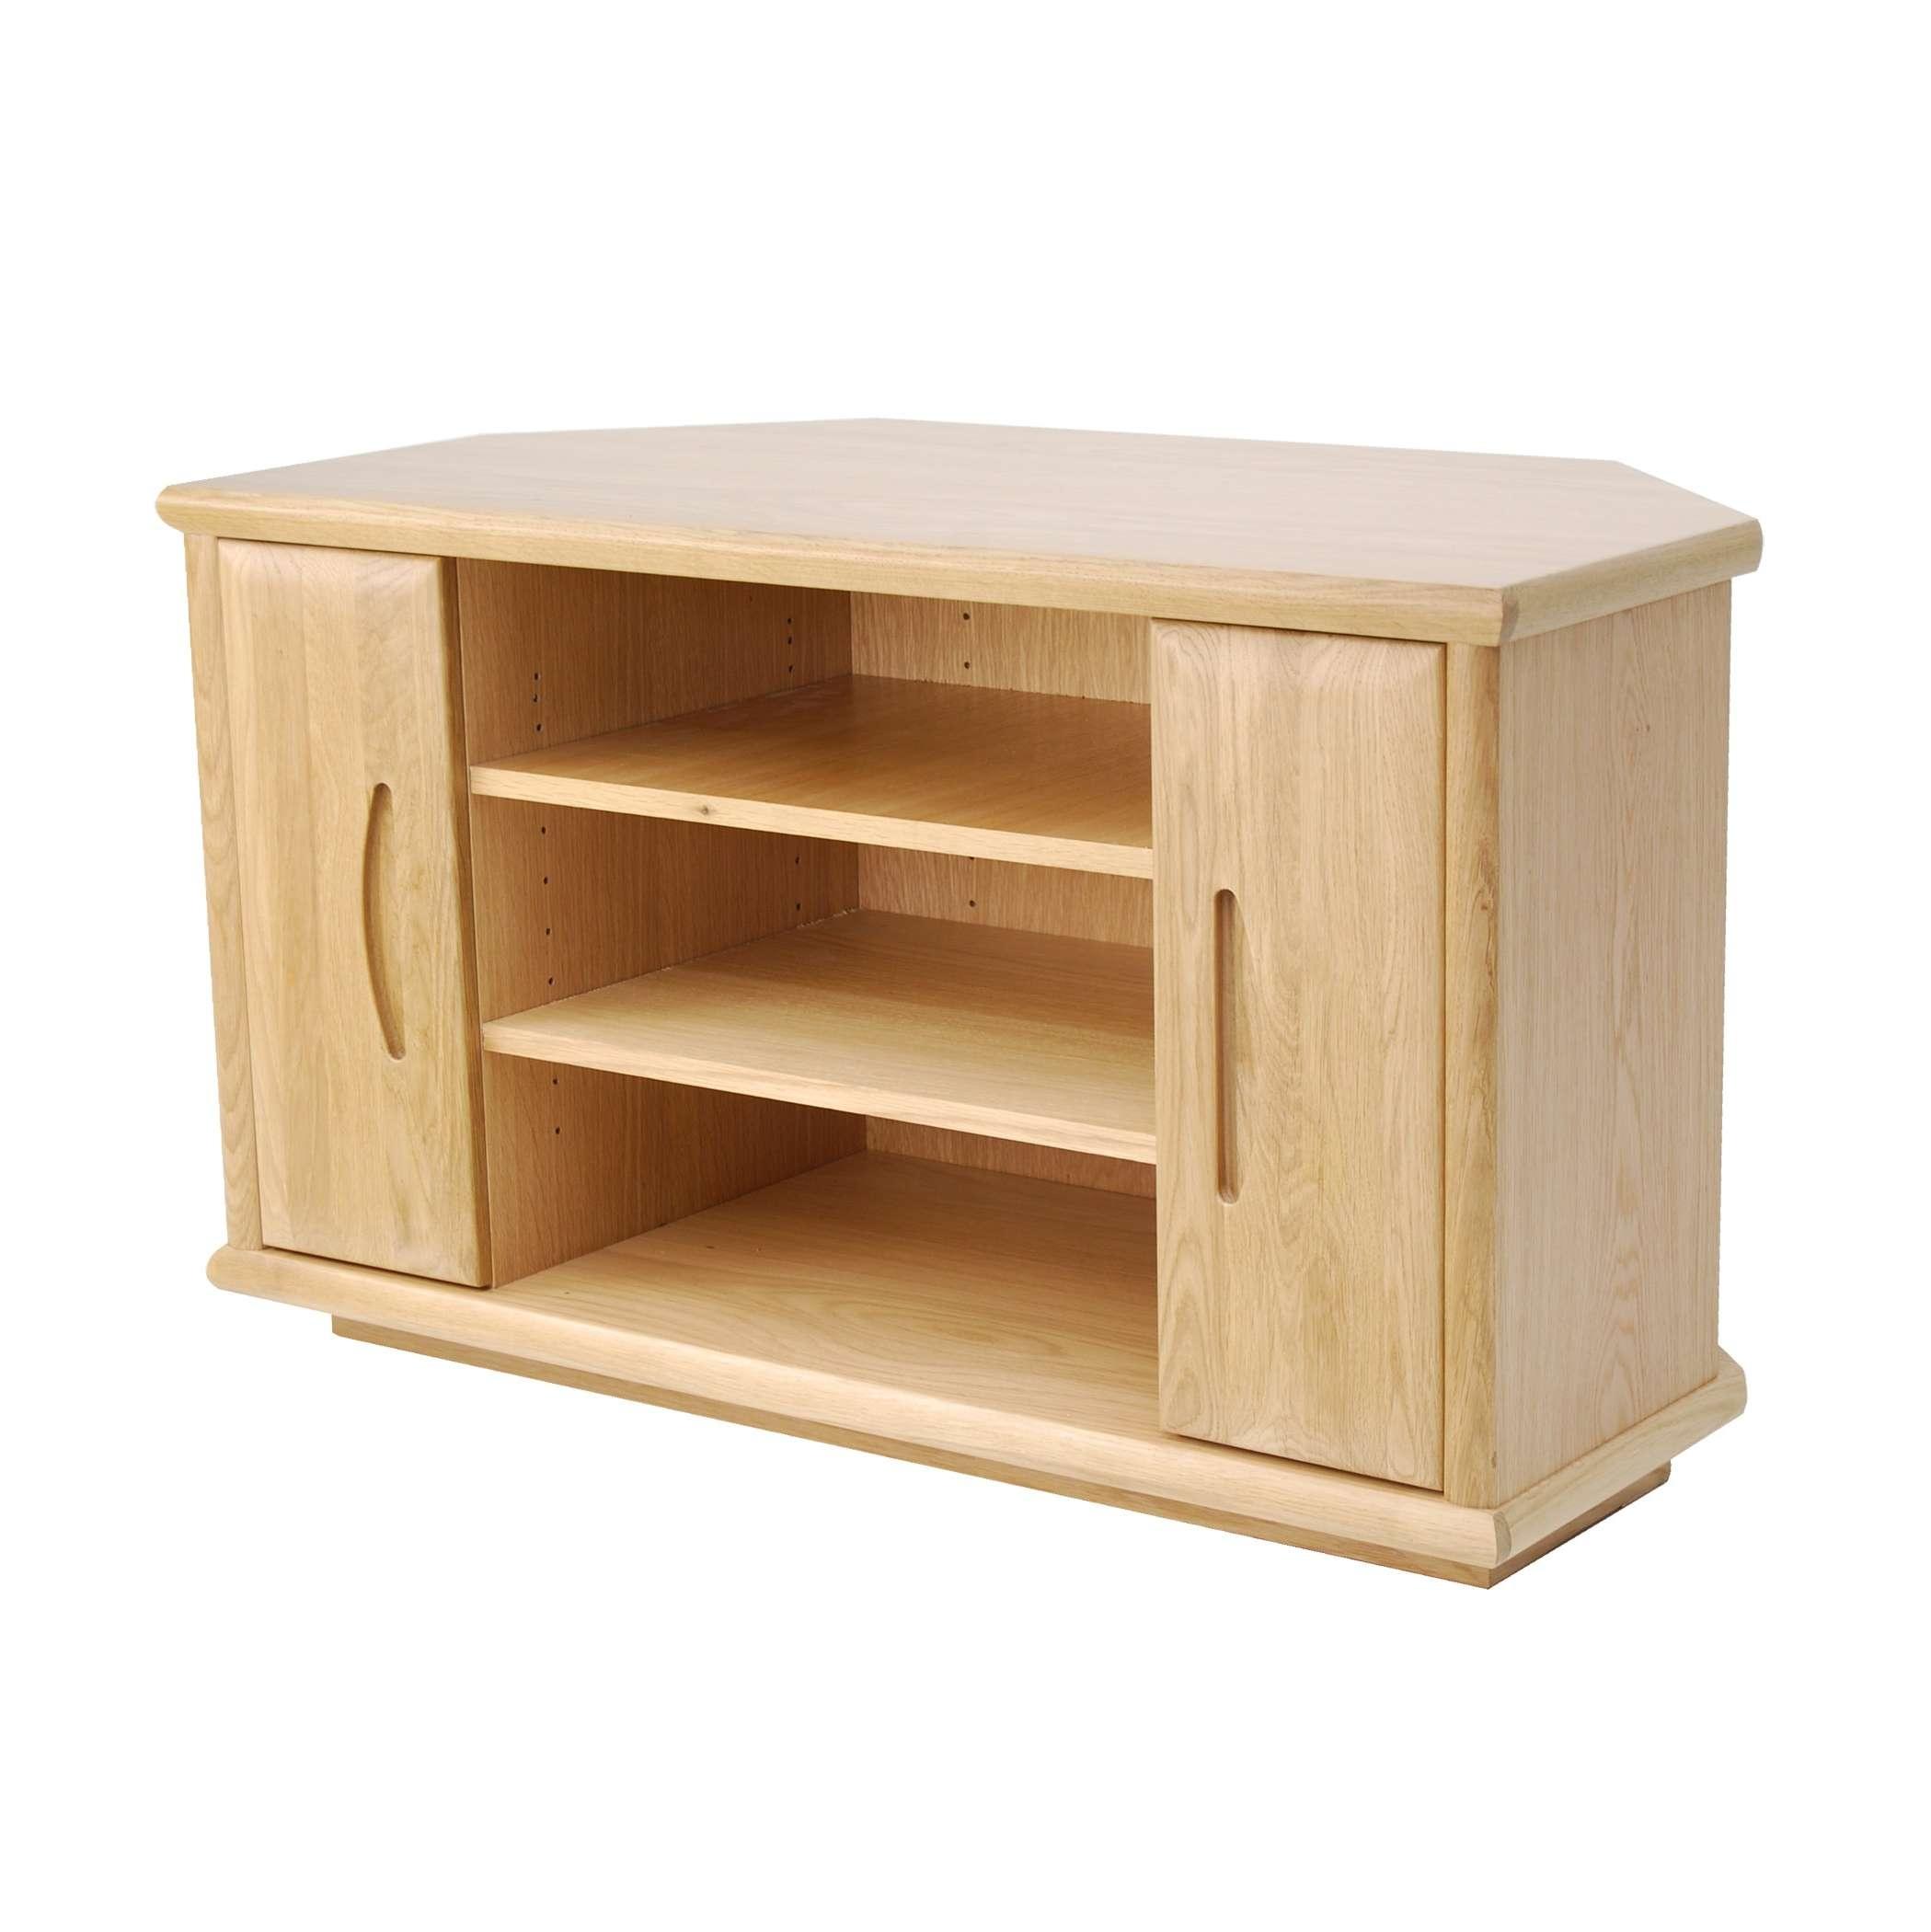 Oak Corner Tv Stand | Gola Furniture Uk In Dark Wood Corner Tv Stands (View 8 of 15)